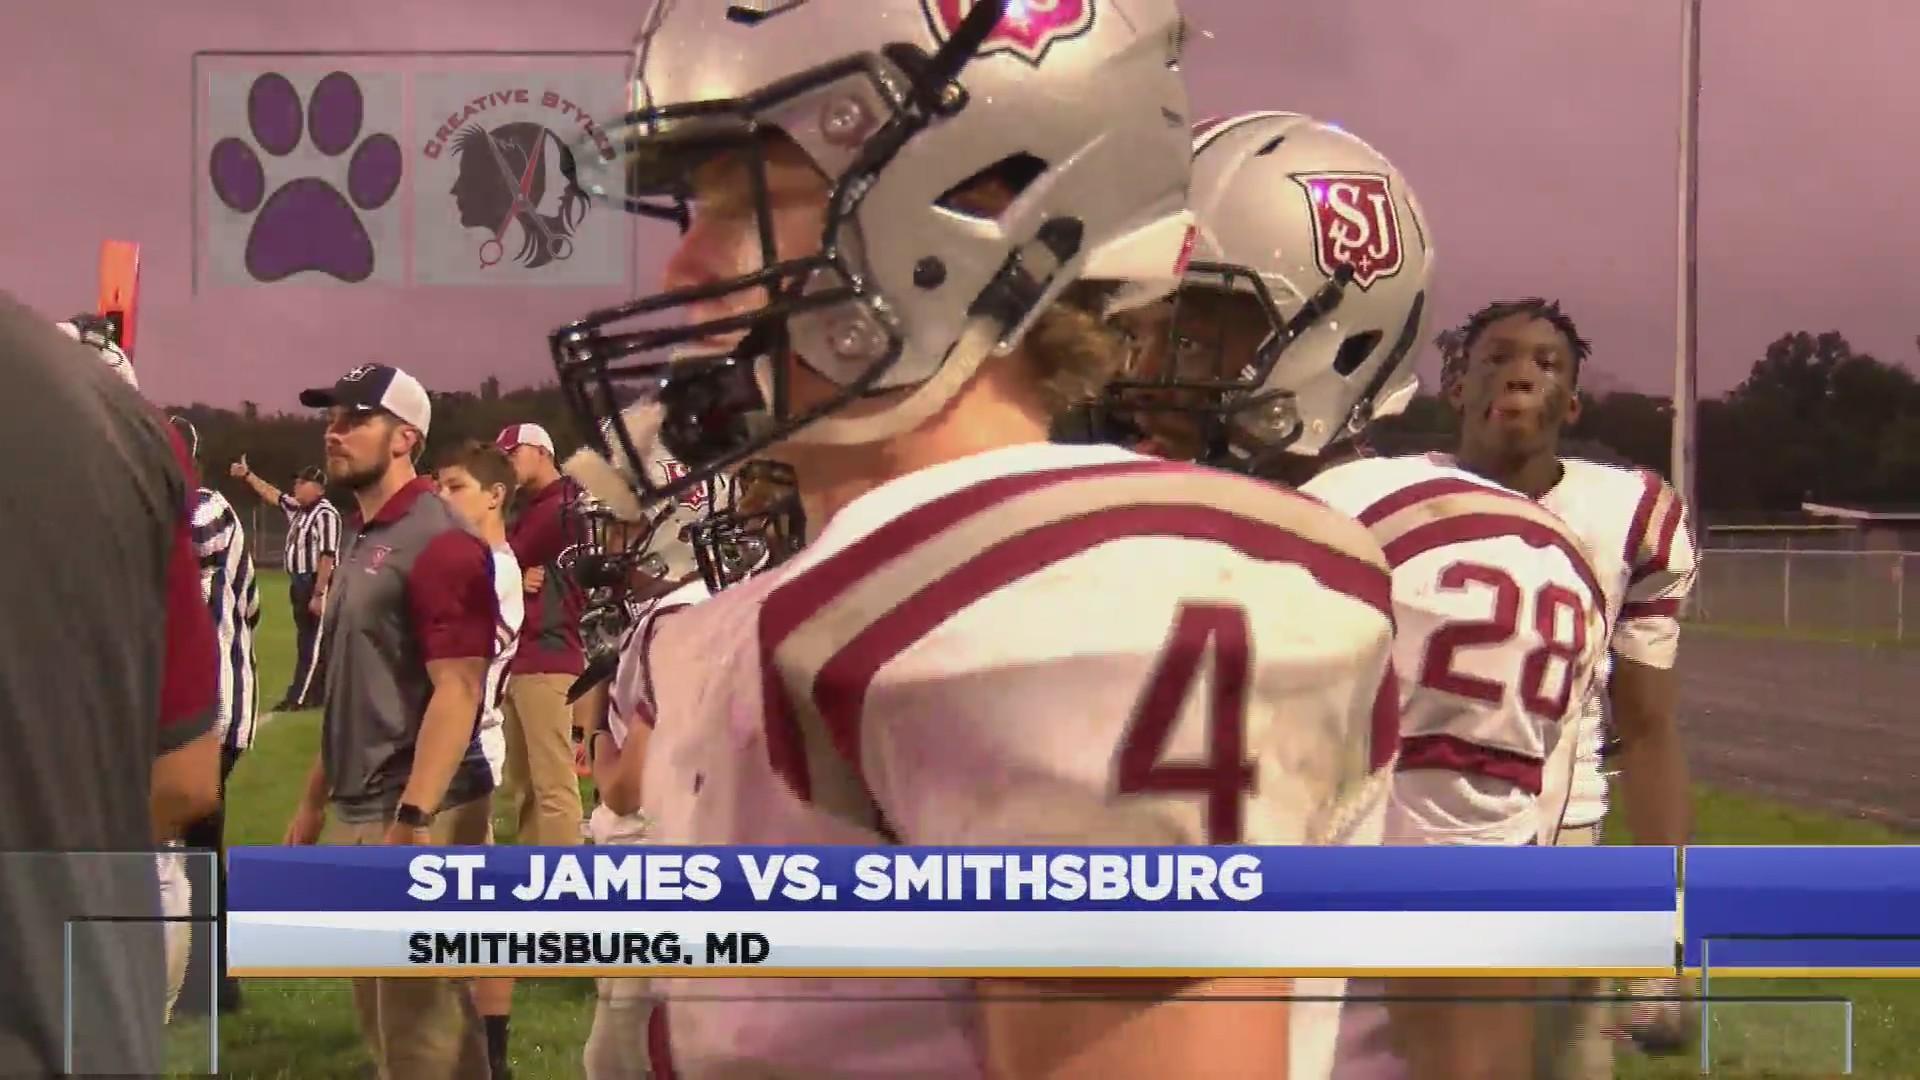 St_James_vs_Smithsburg_0_20180915034818